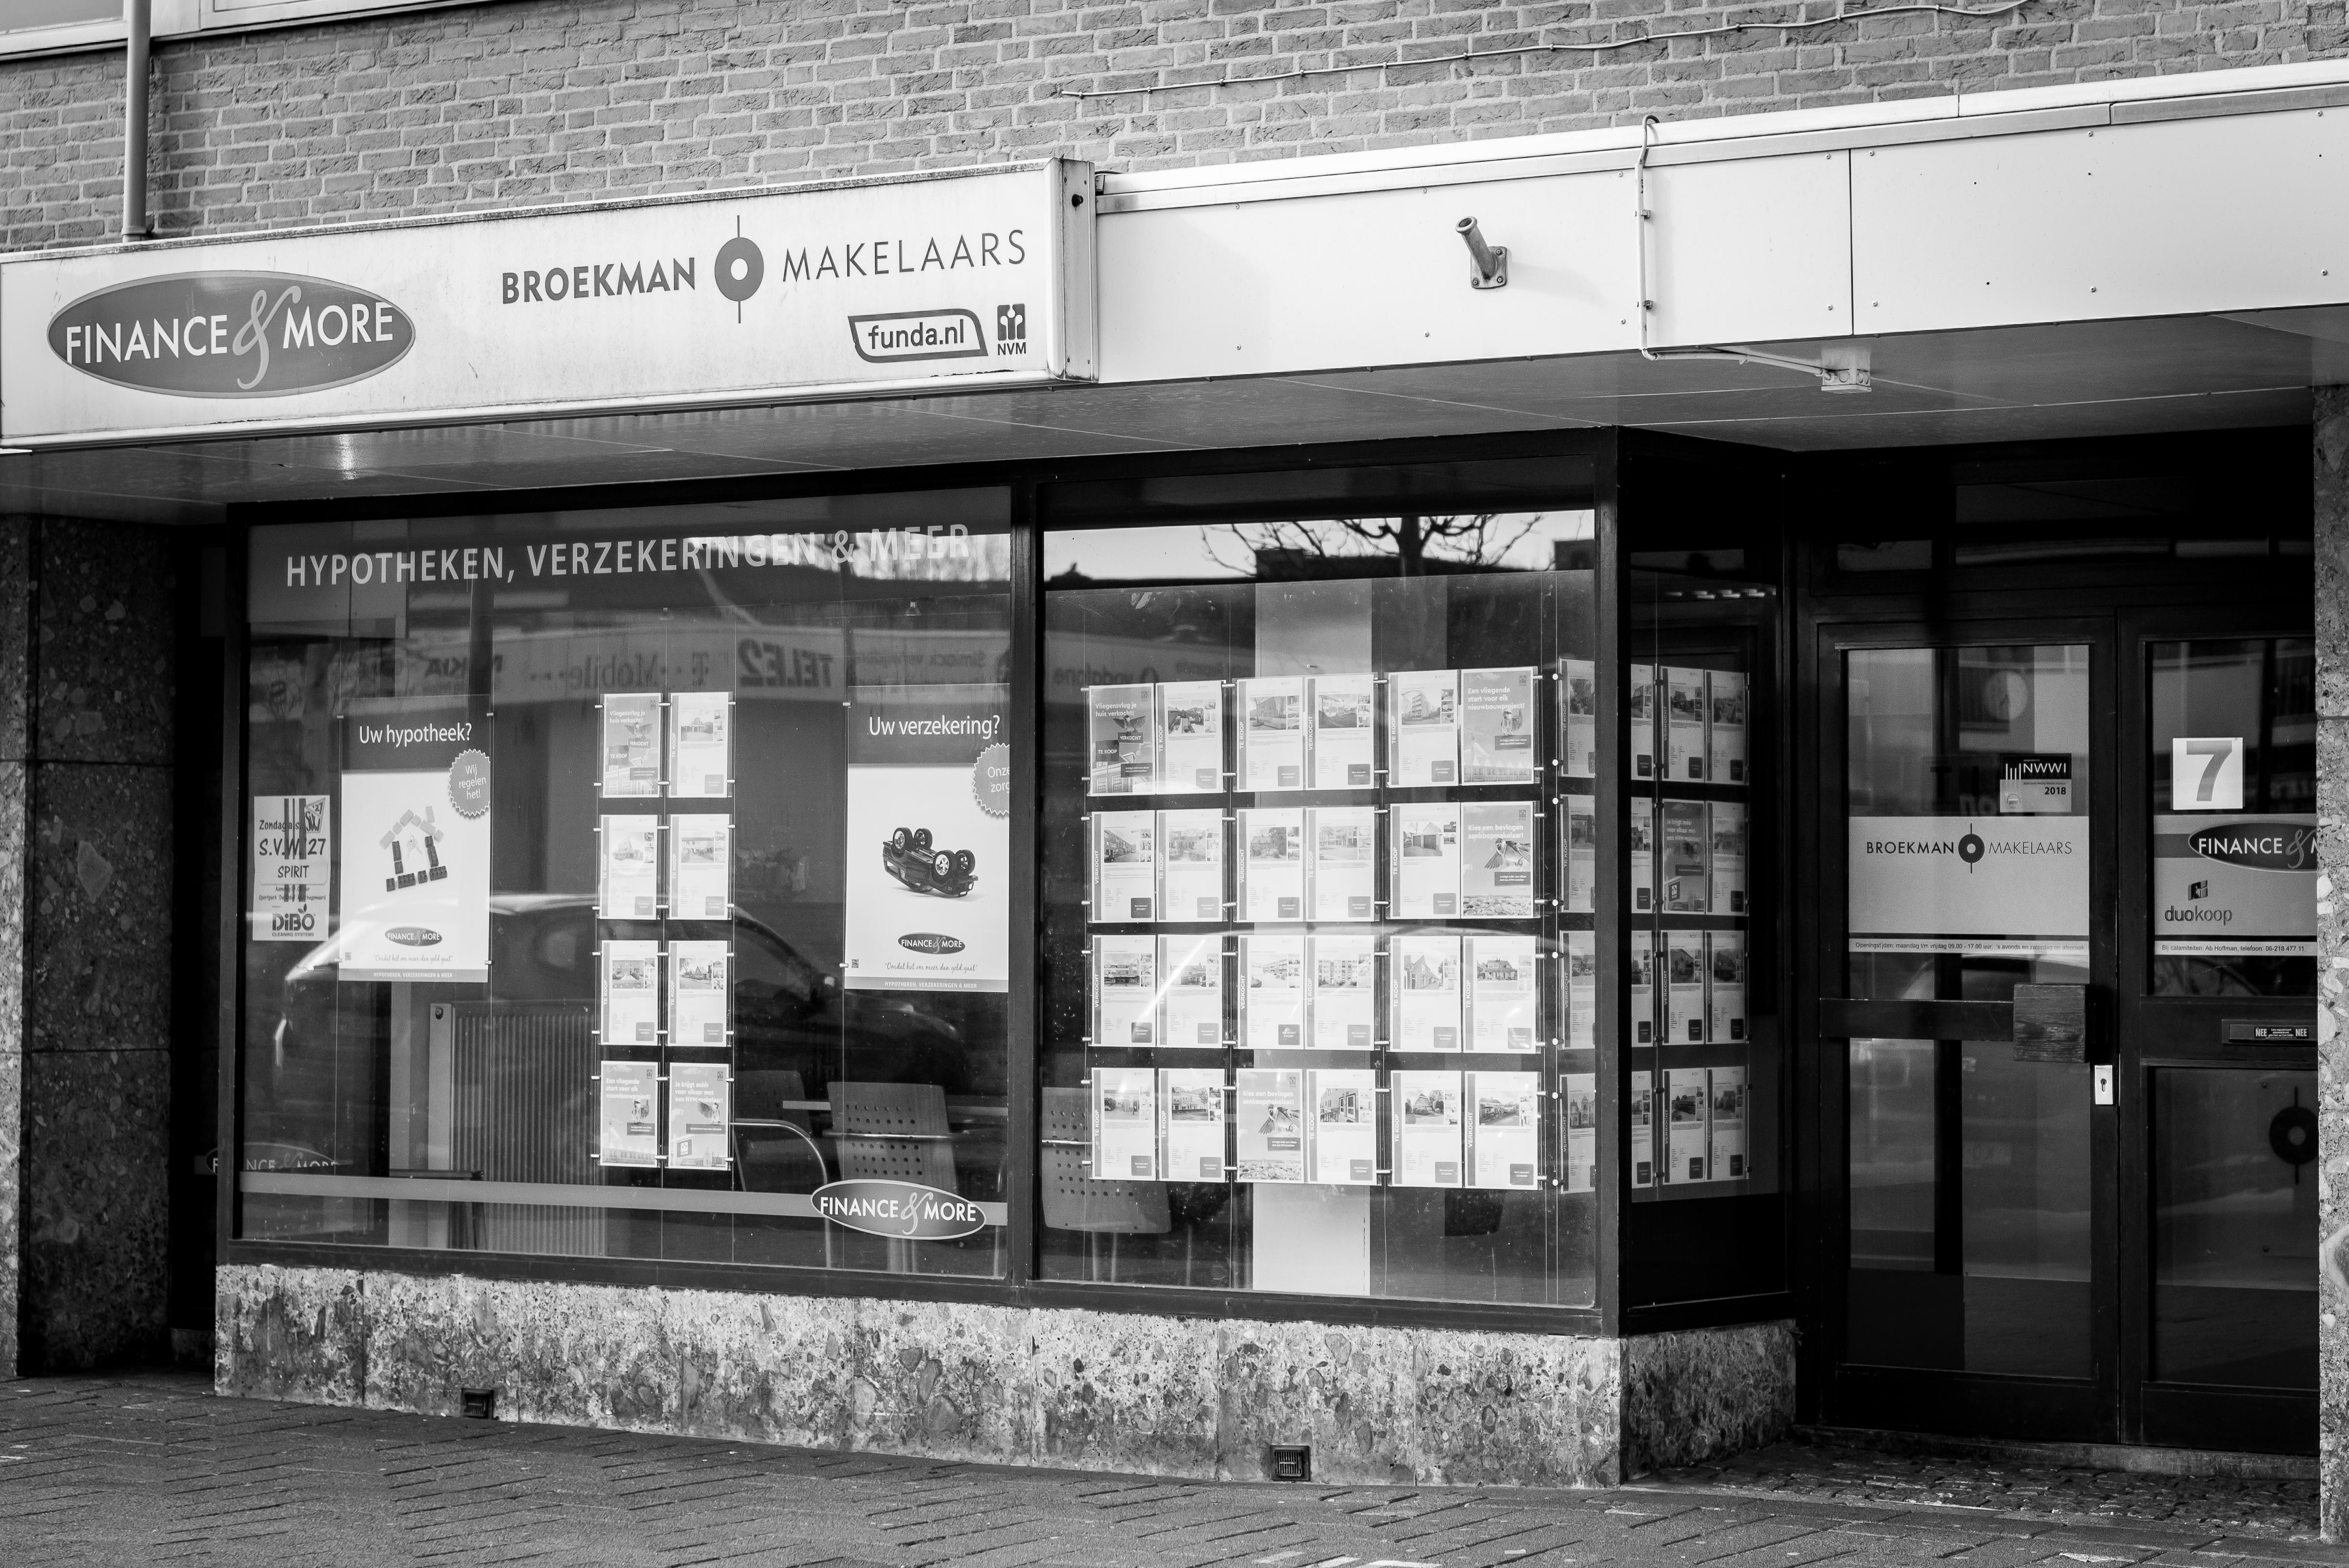 Kantoor Vestiging Broekman Makelaars Heerhugowaard